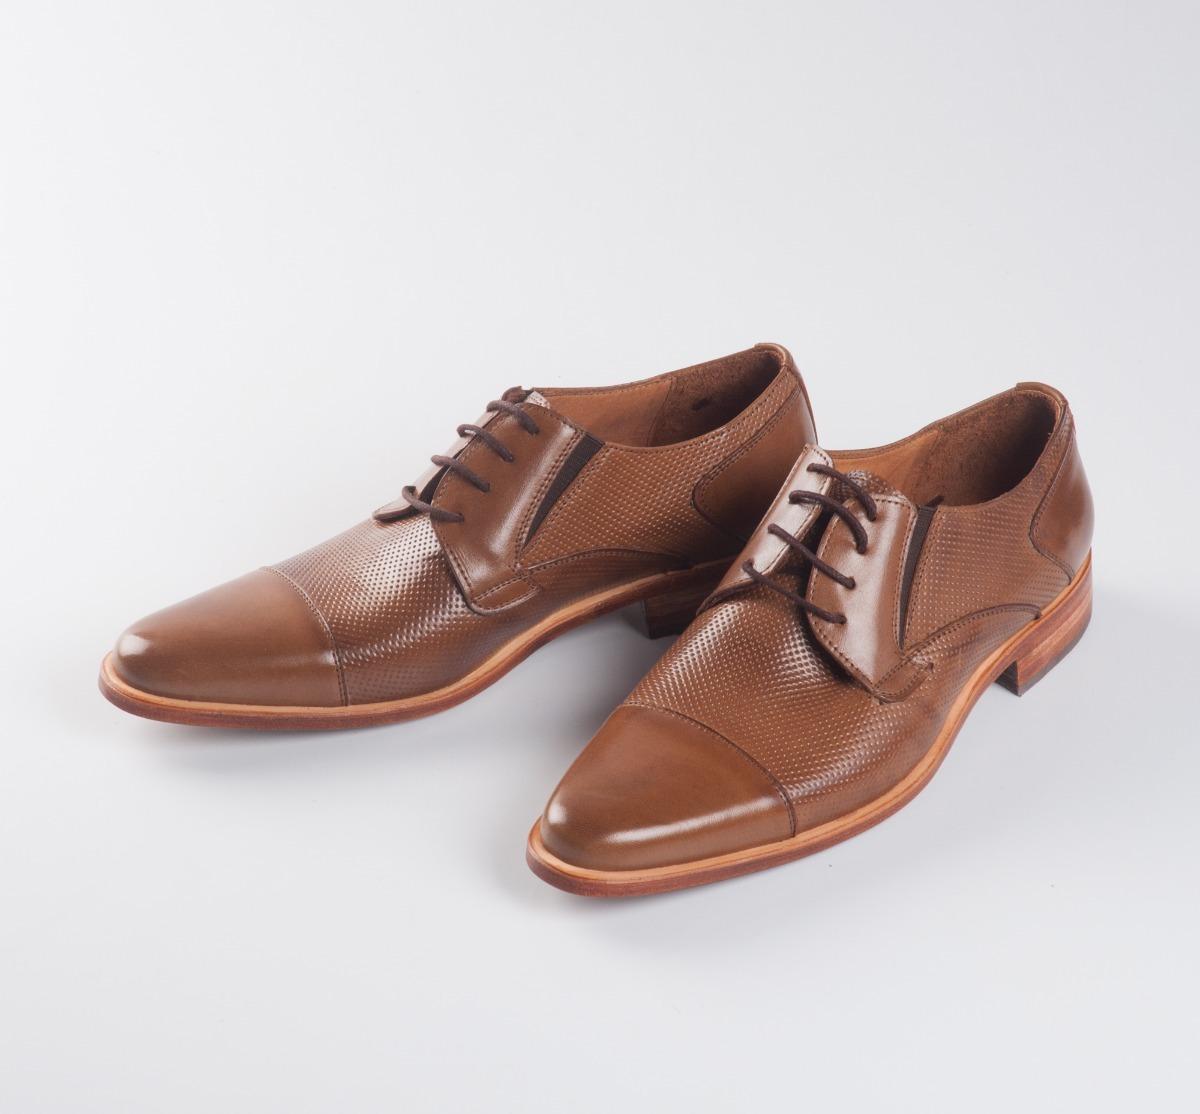 9ebf0a96 Zapatos De Vestir Hombre Cuero Marron - $ 3.675,00 en Mercado Libre